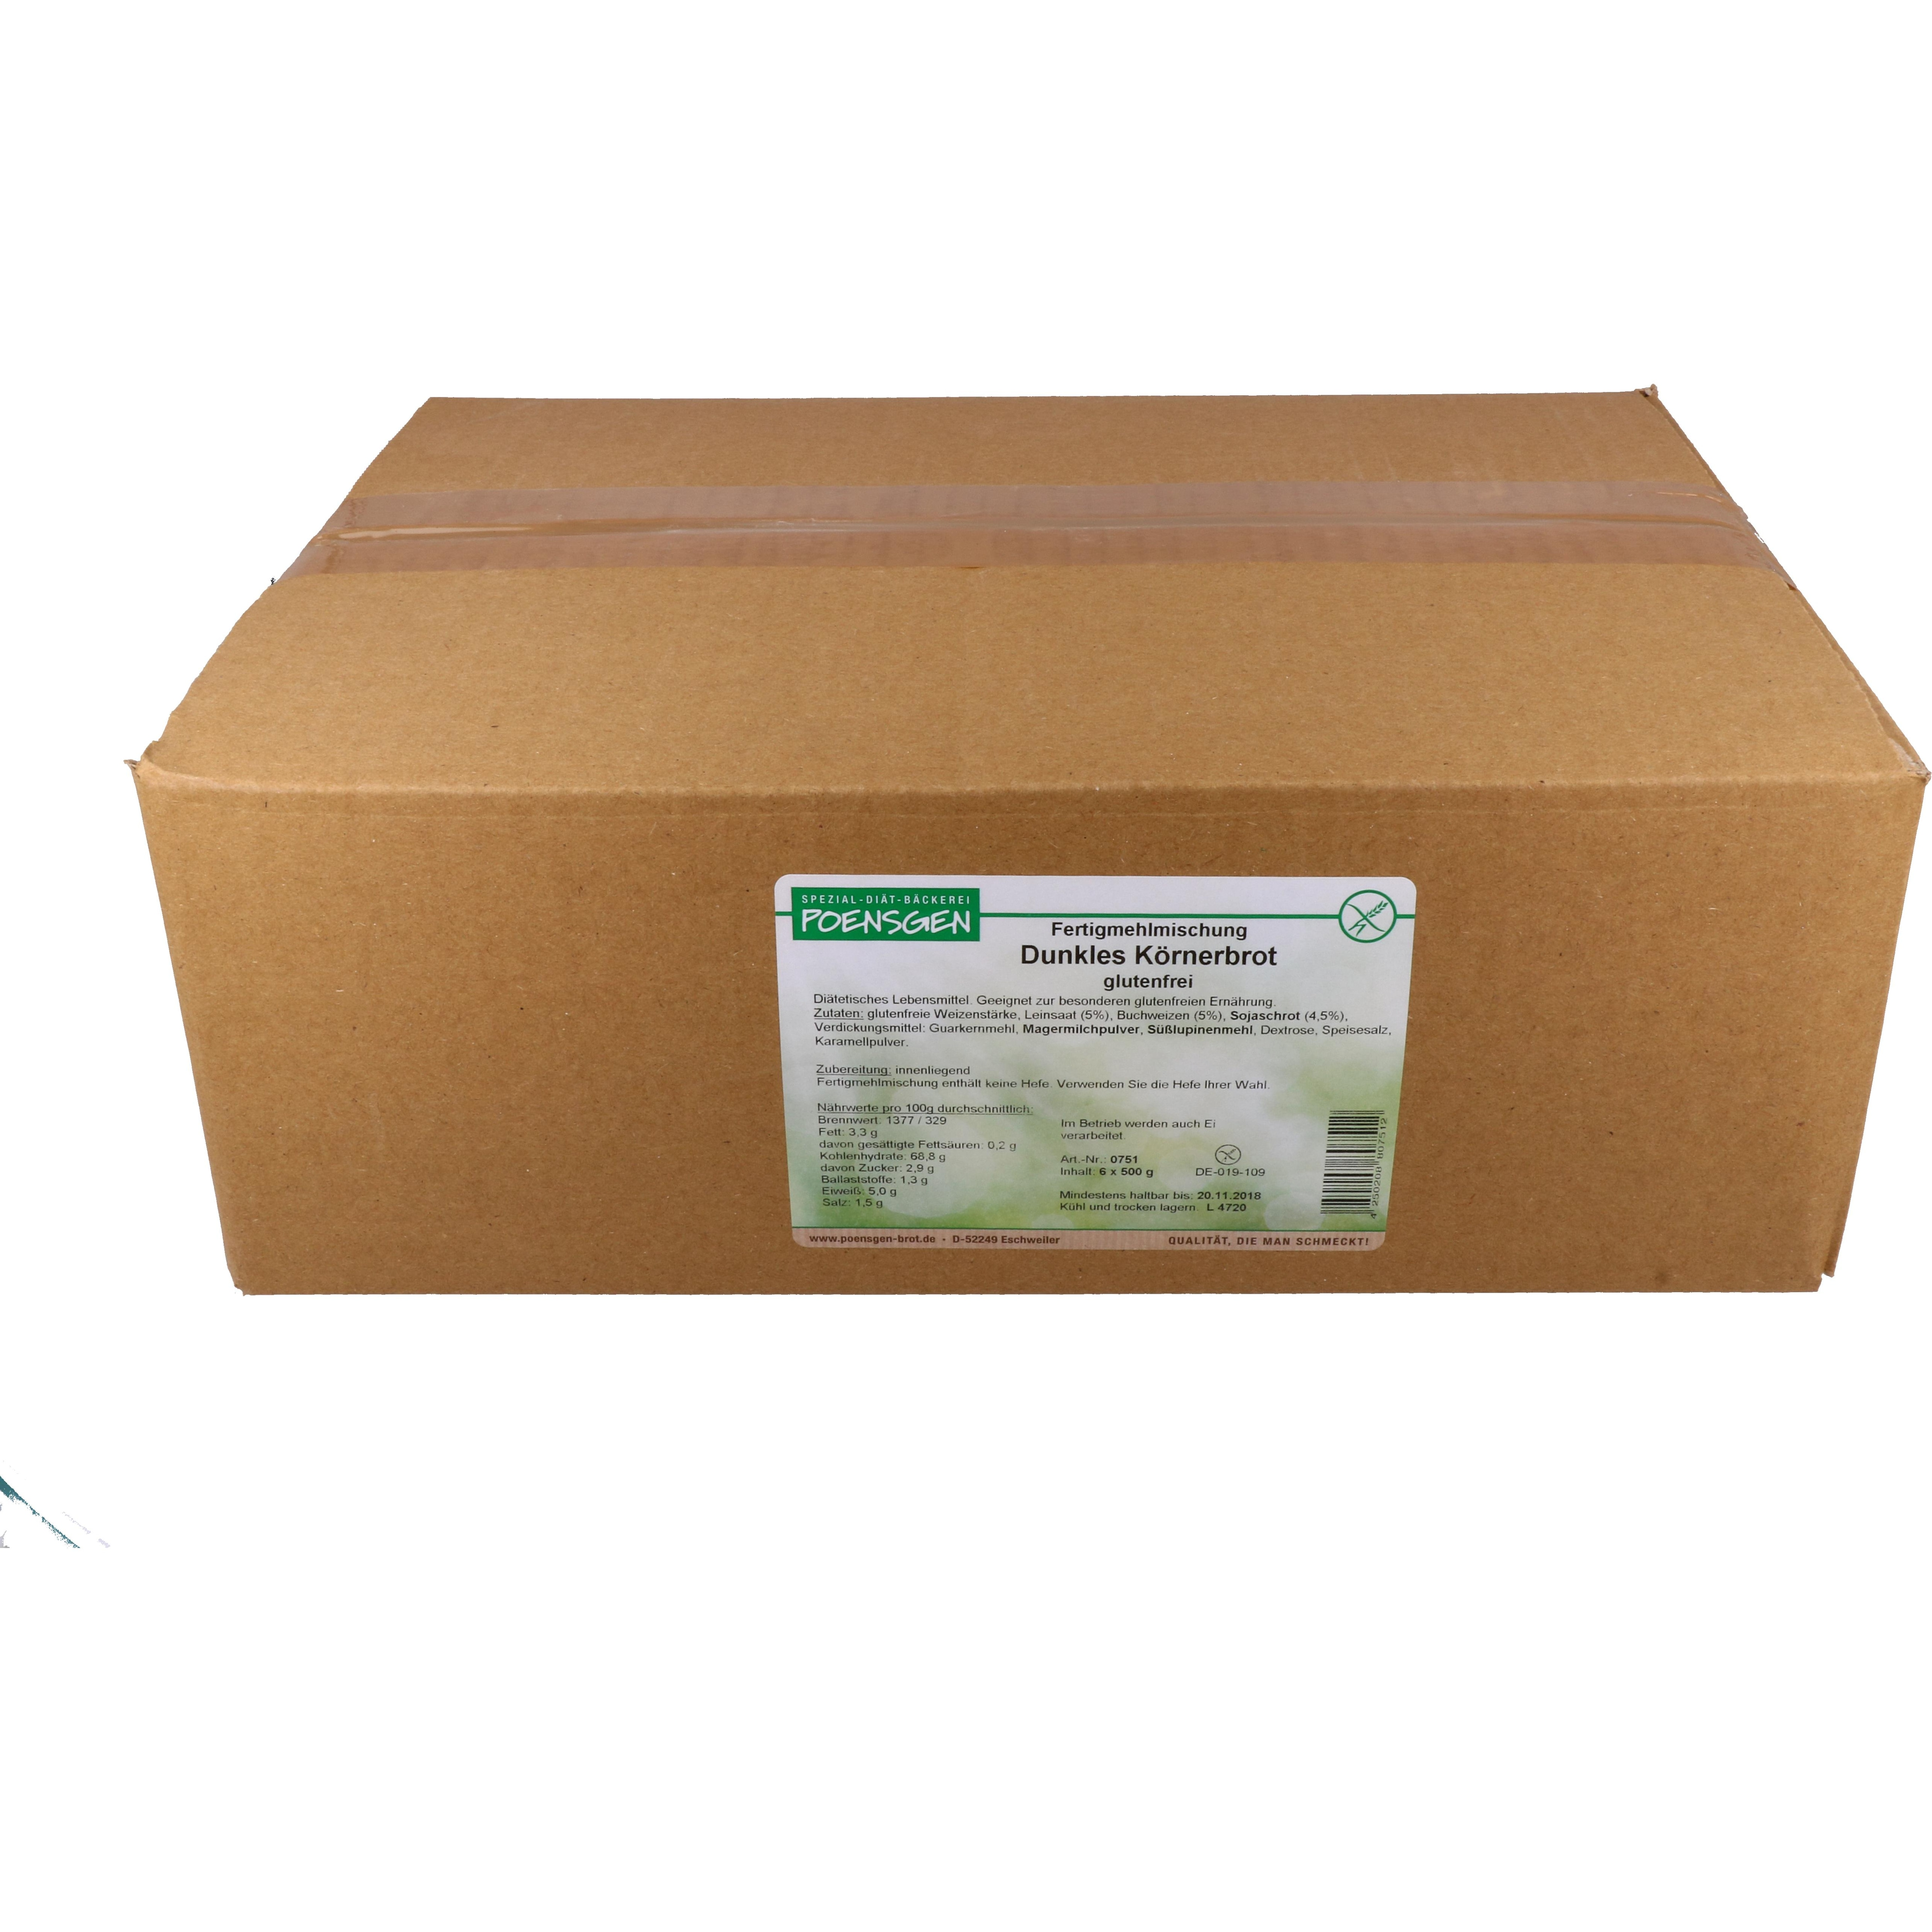 Poensgen Fertigmehlmischung Dunkles Körnerbrot 6 x 500g